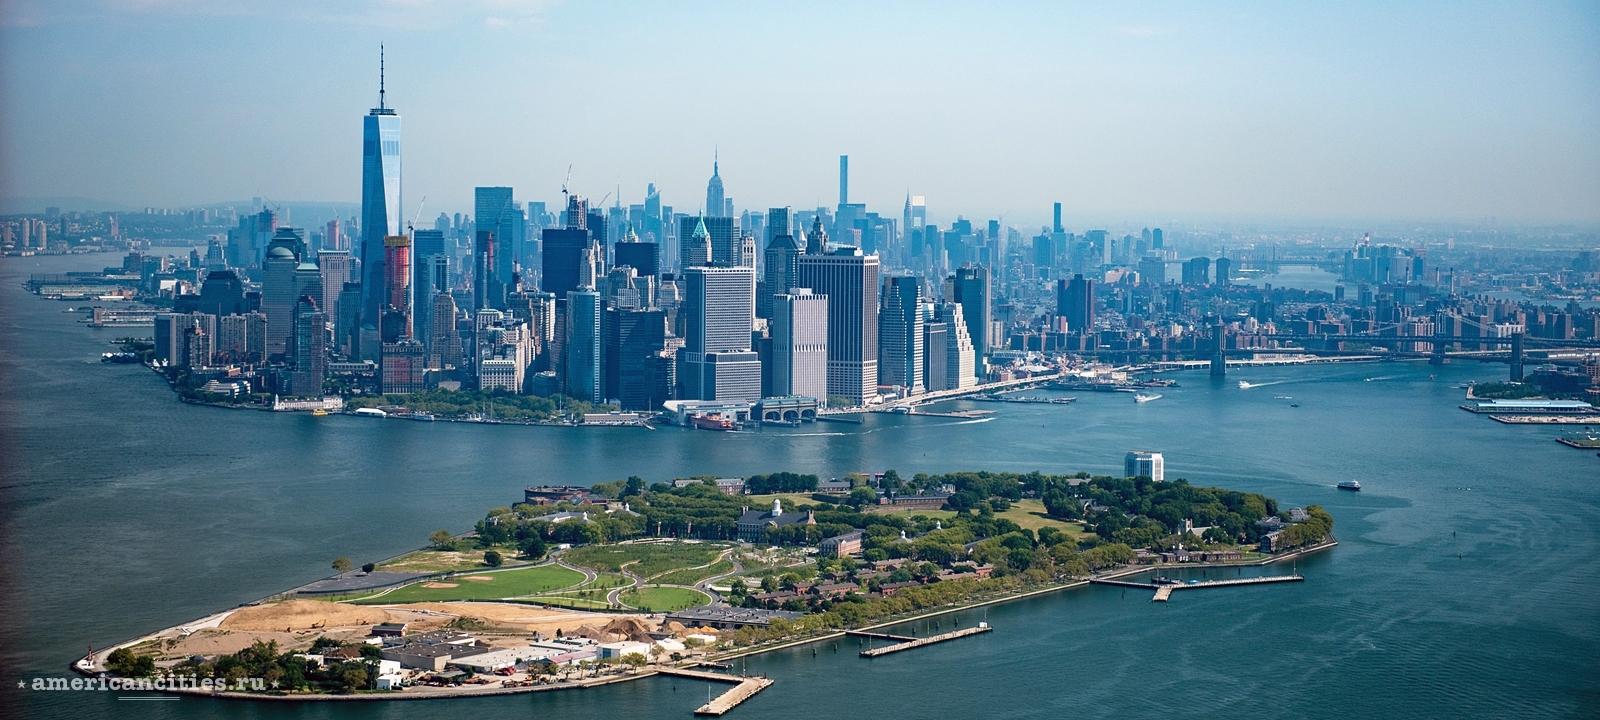 Фото Манхэттена с высоты